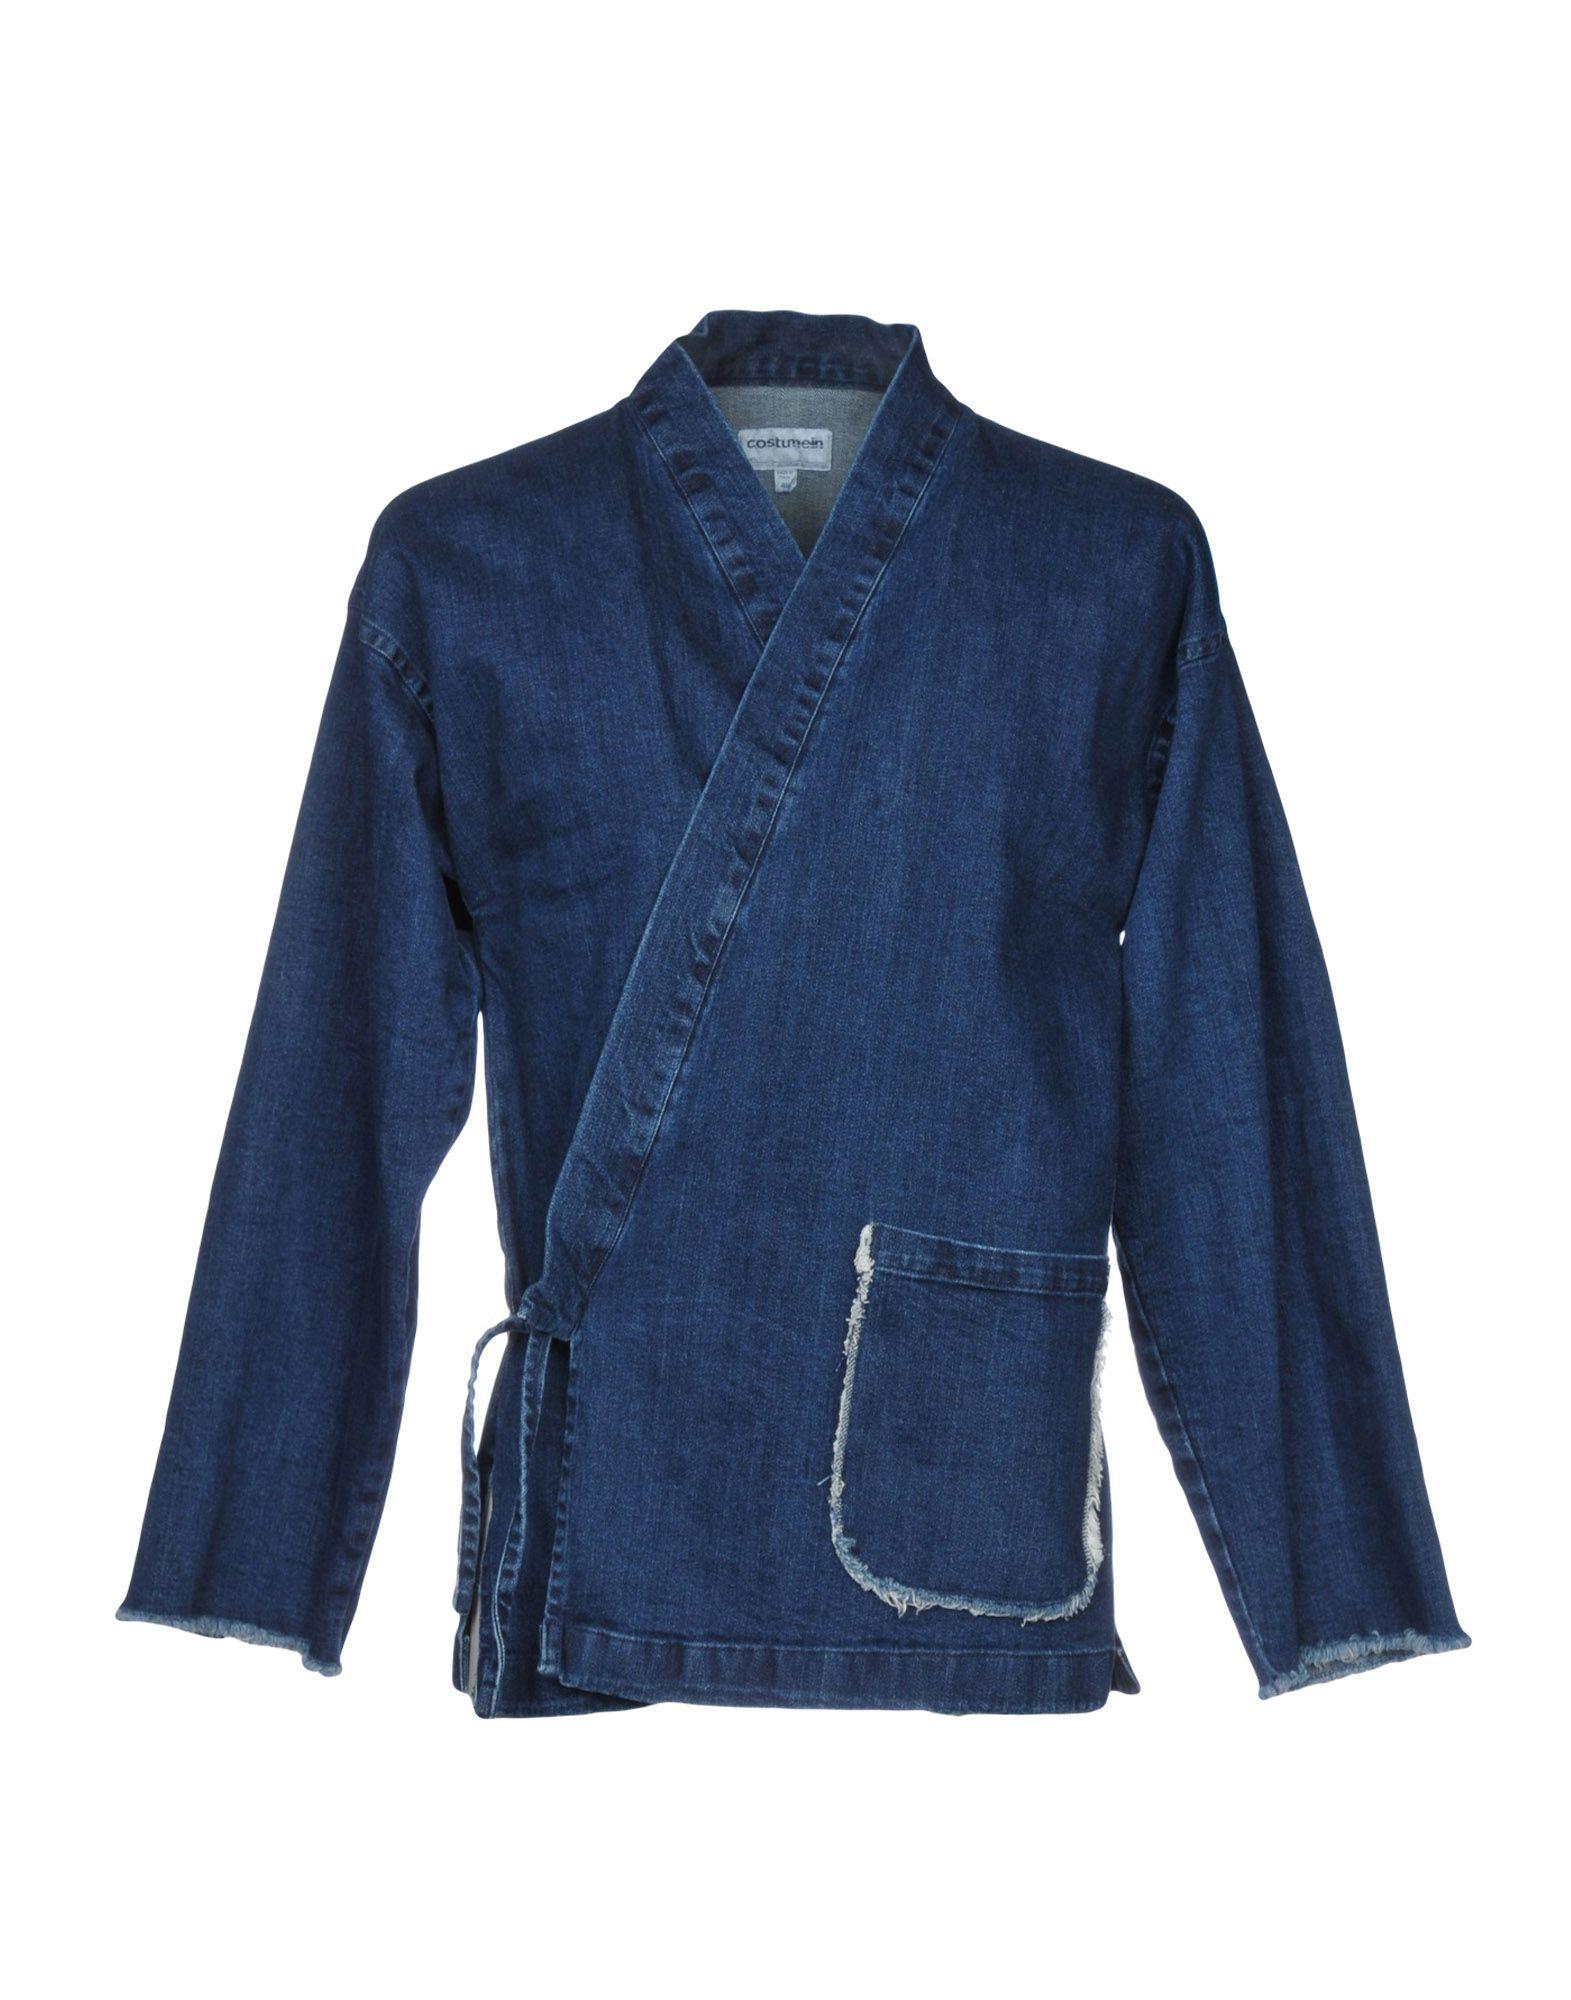 COSTUMEIN Blazers in Blue